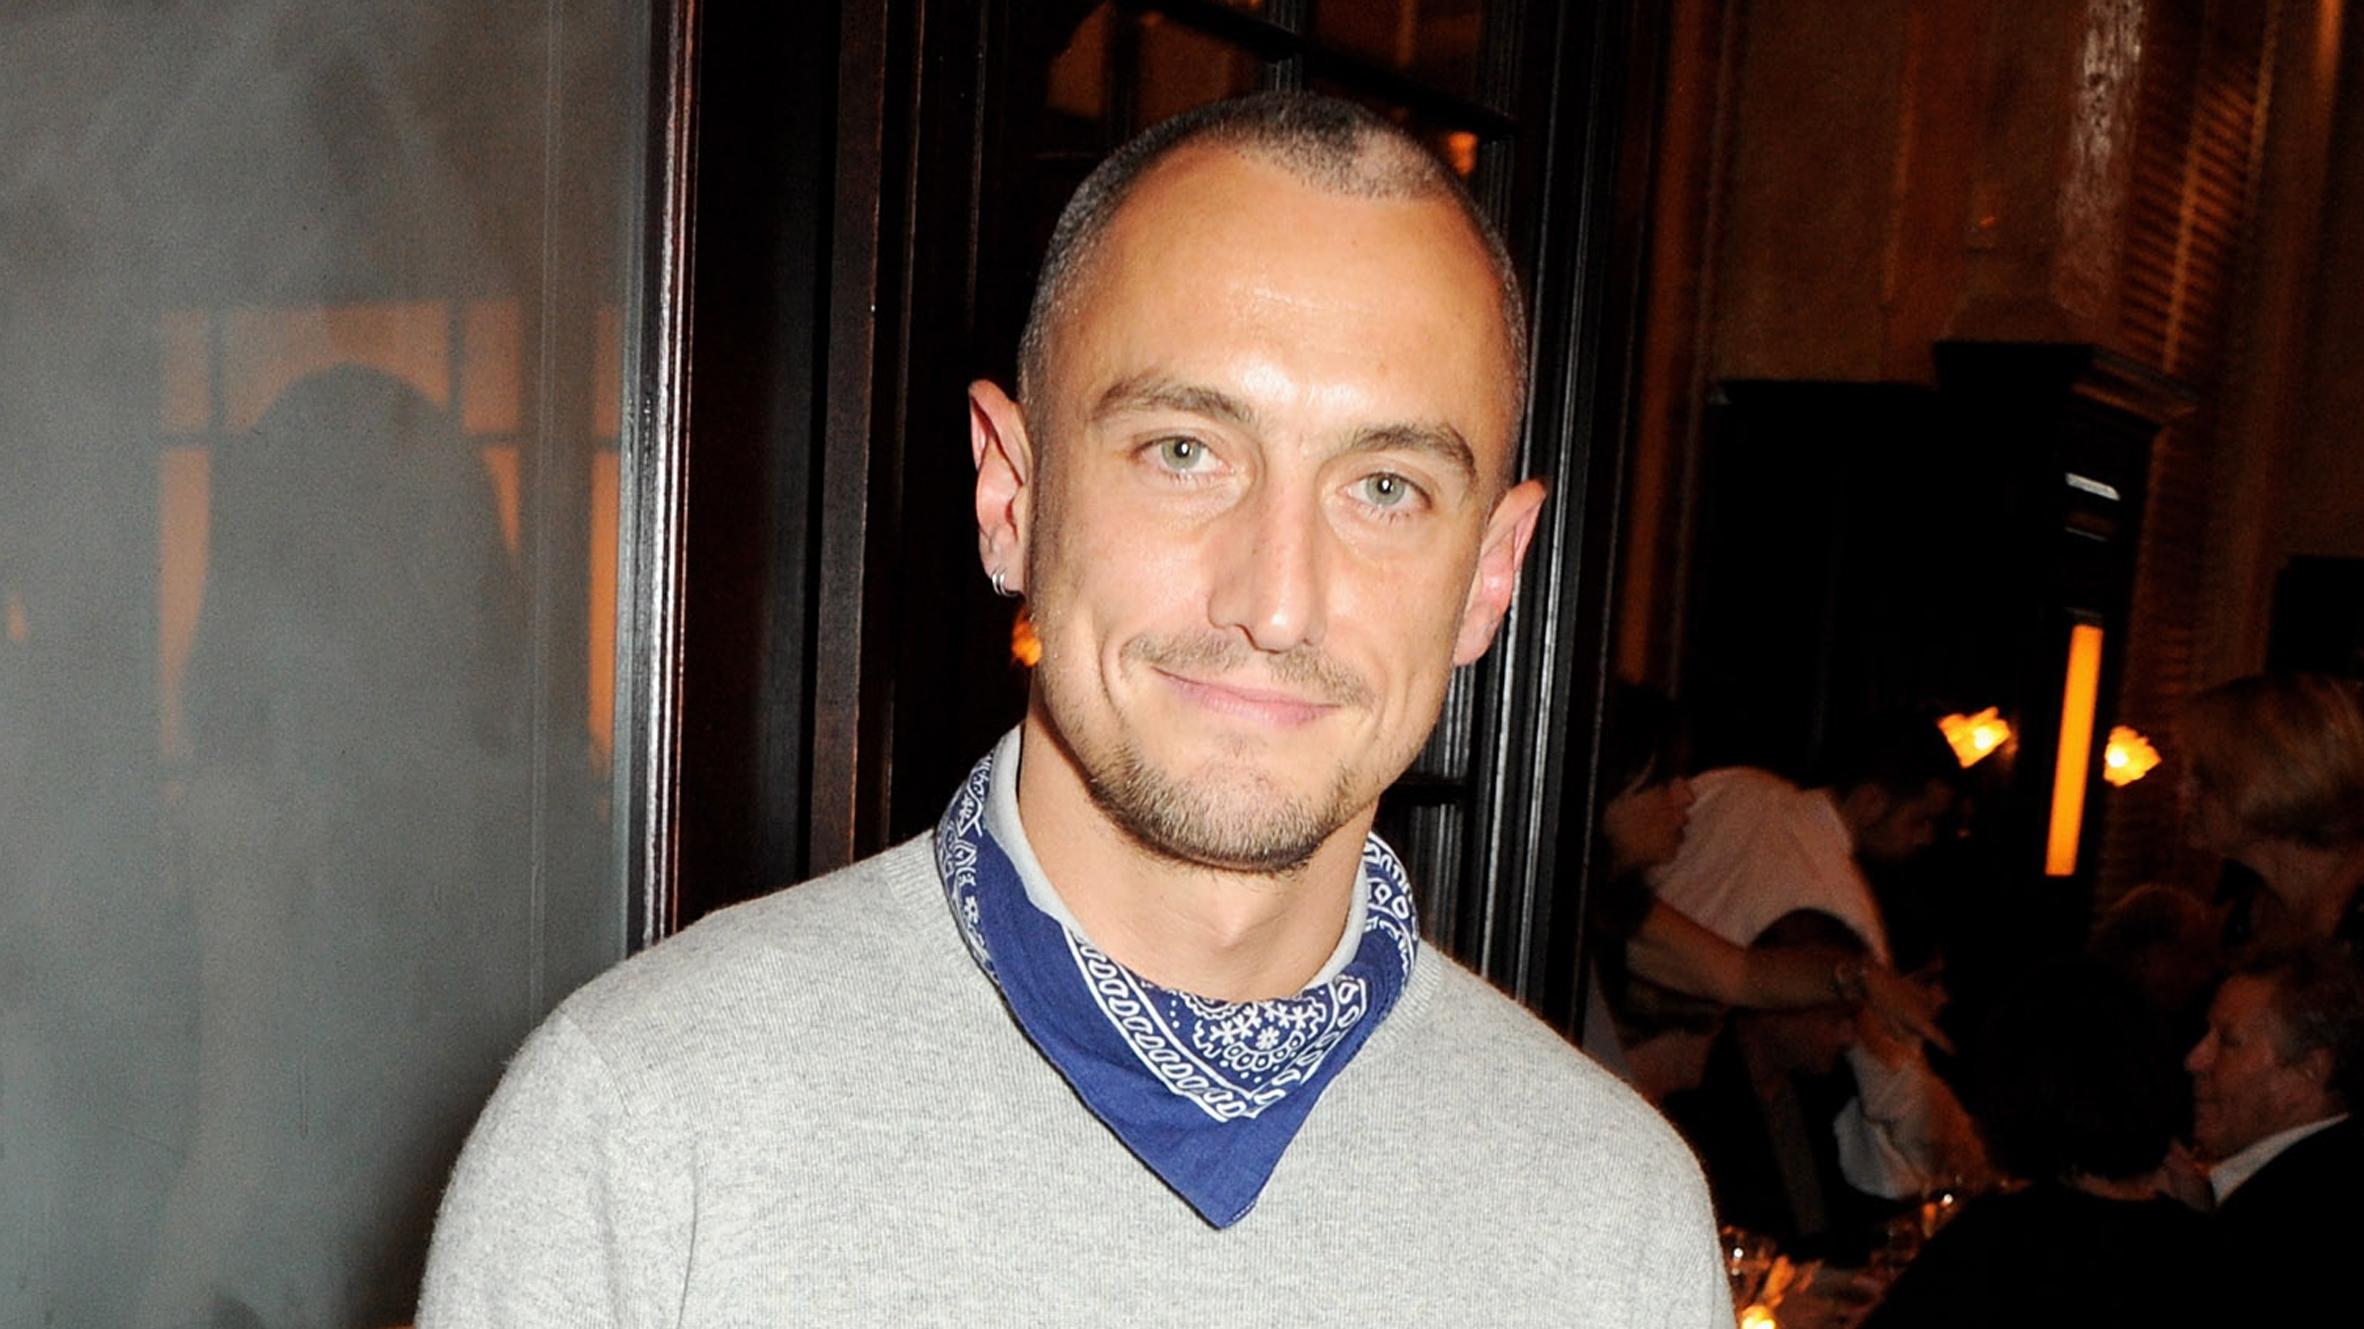 Fashion Designer Richard Nicoll Dies Suddenly Age 39